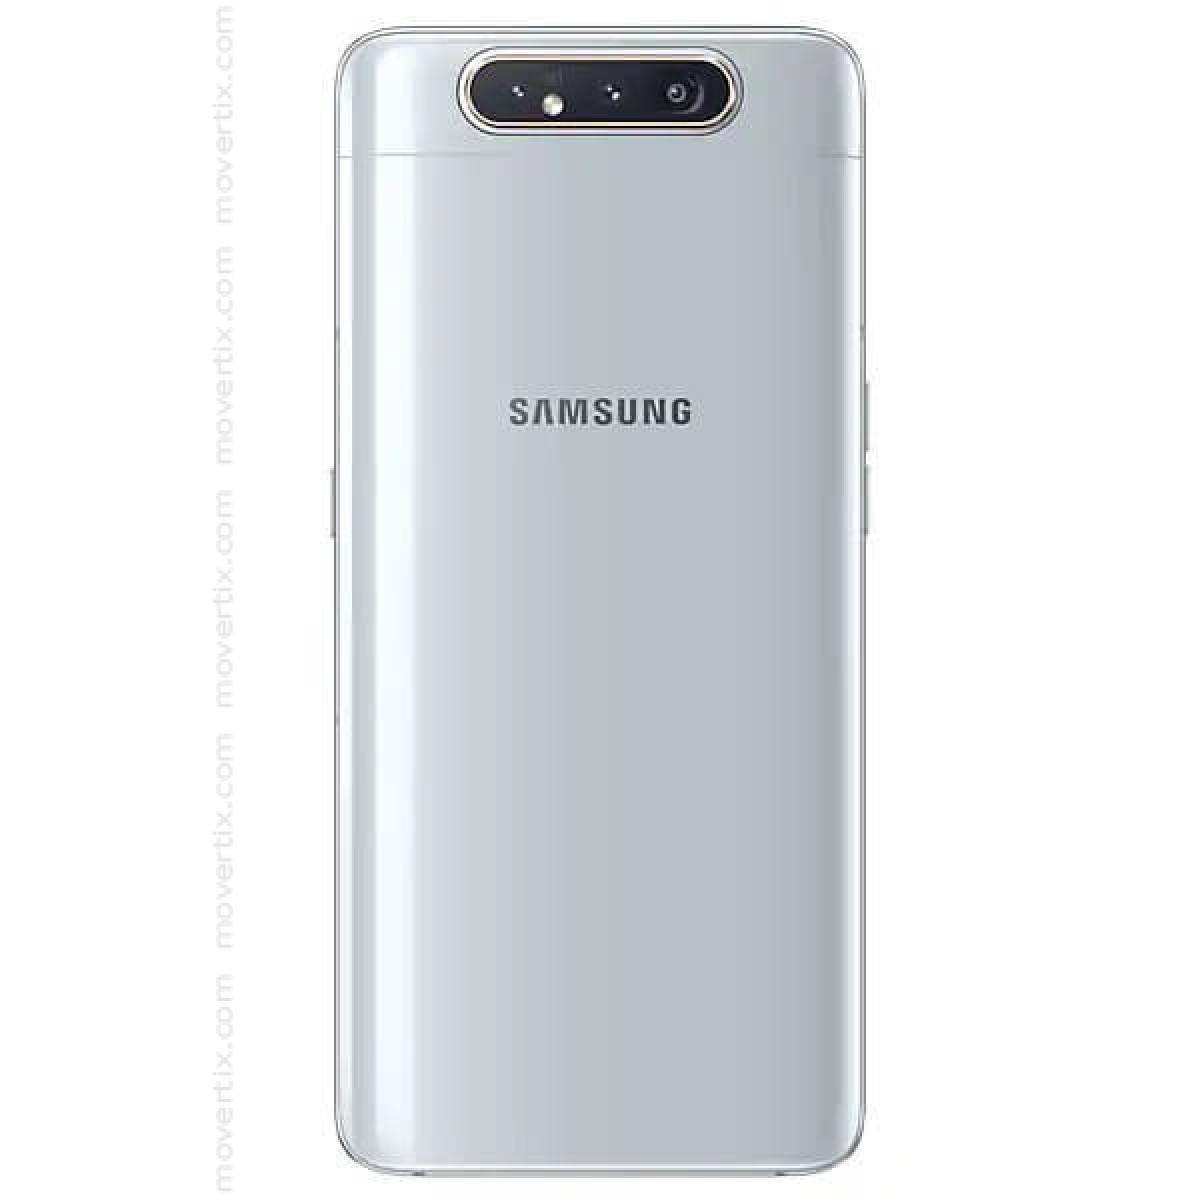 Samsung Galaxy A80 performance and cameras